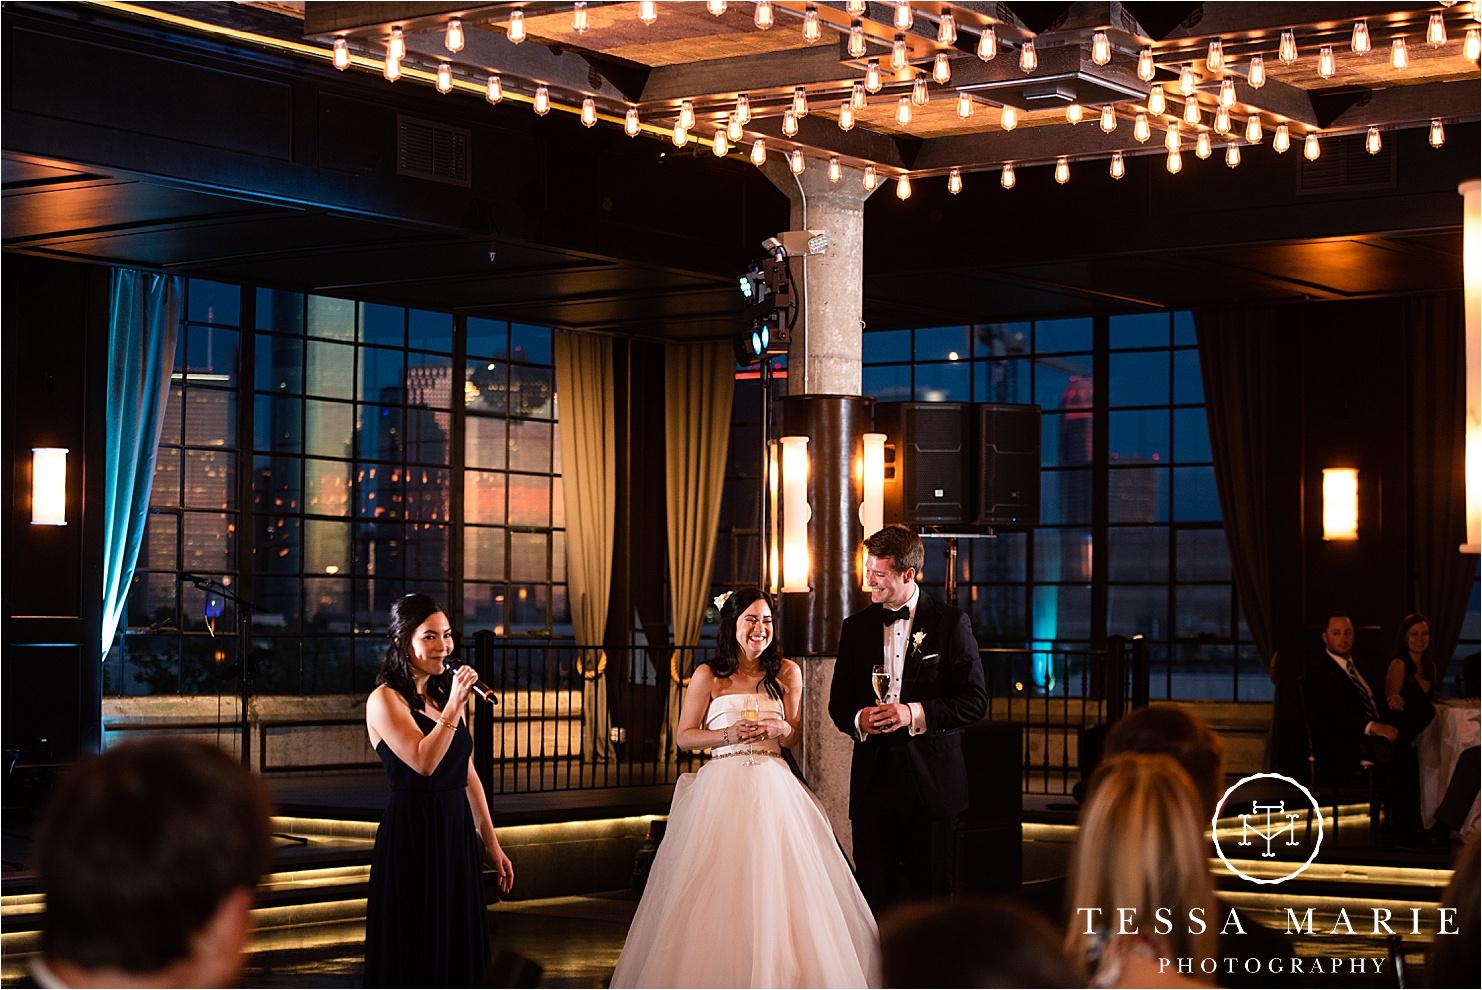 Tessa_marie_weddings_houston_wedding_photographer_The_astorian_0155.jpg